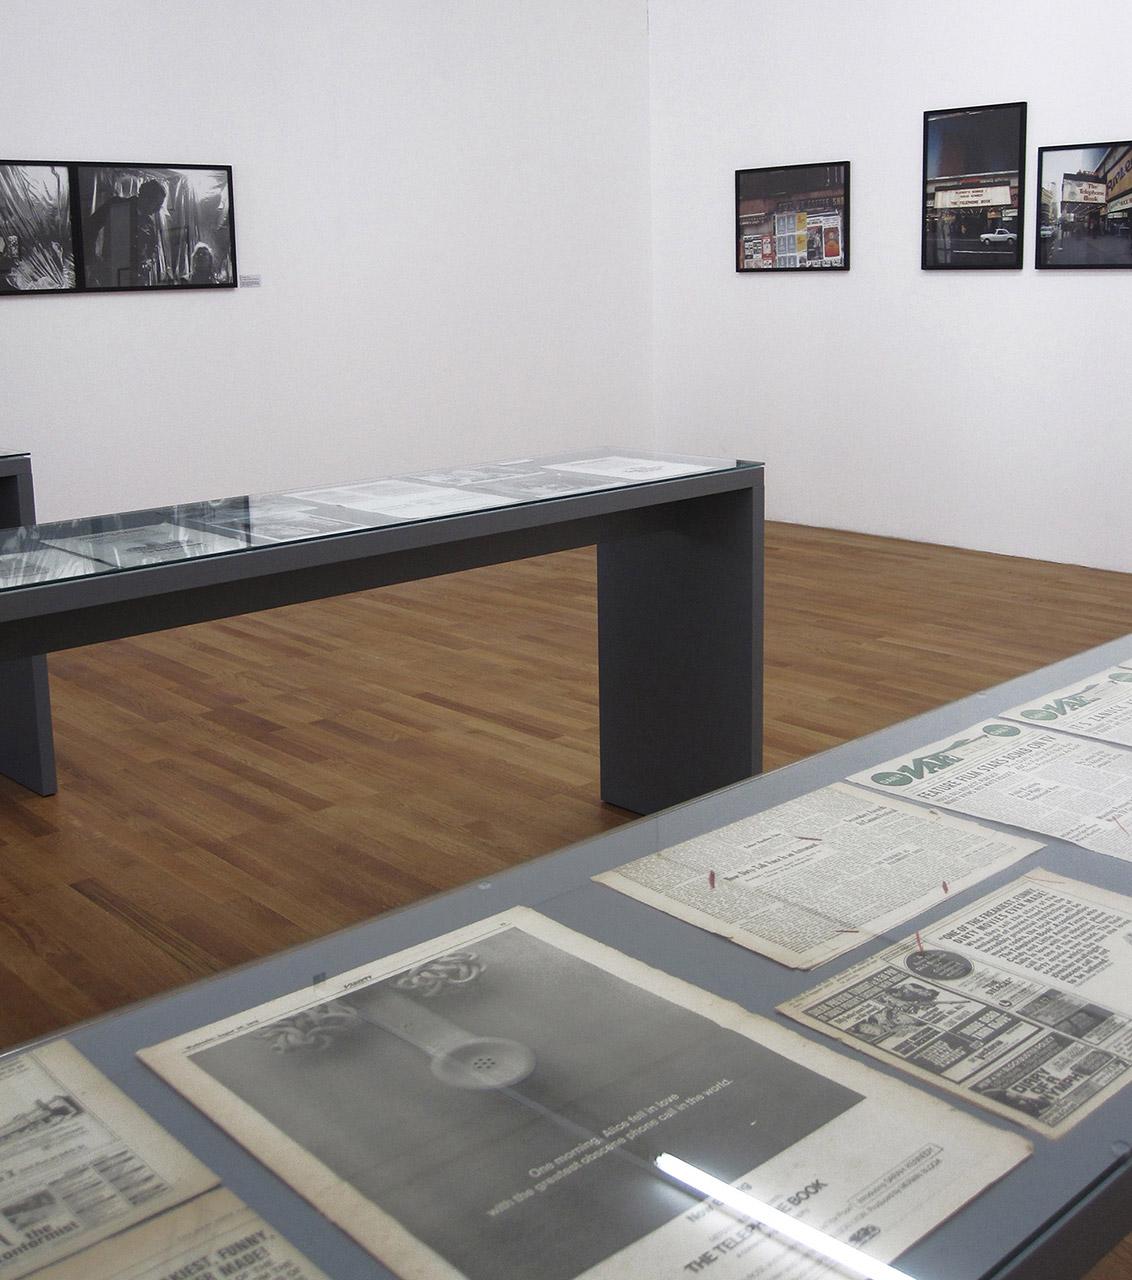 Telephone-Book-Kunsthalle-Winterthur-2010-3.jpg